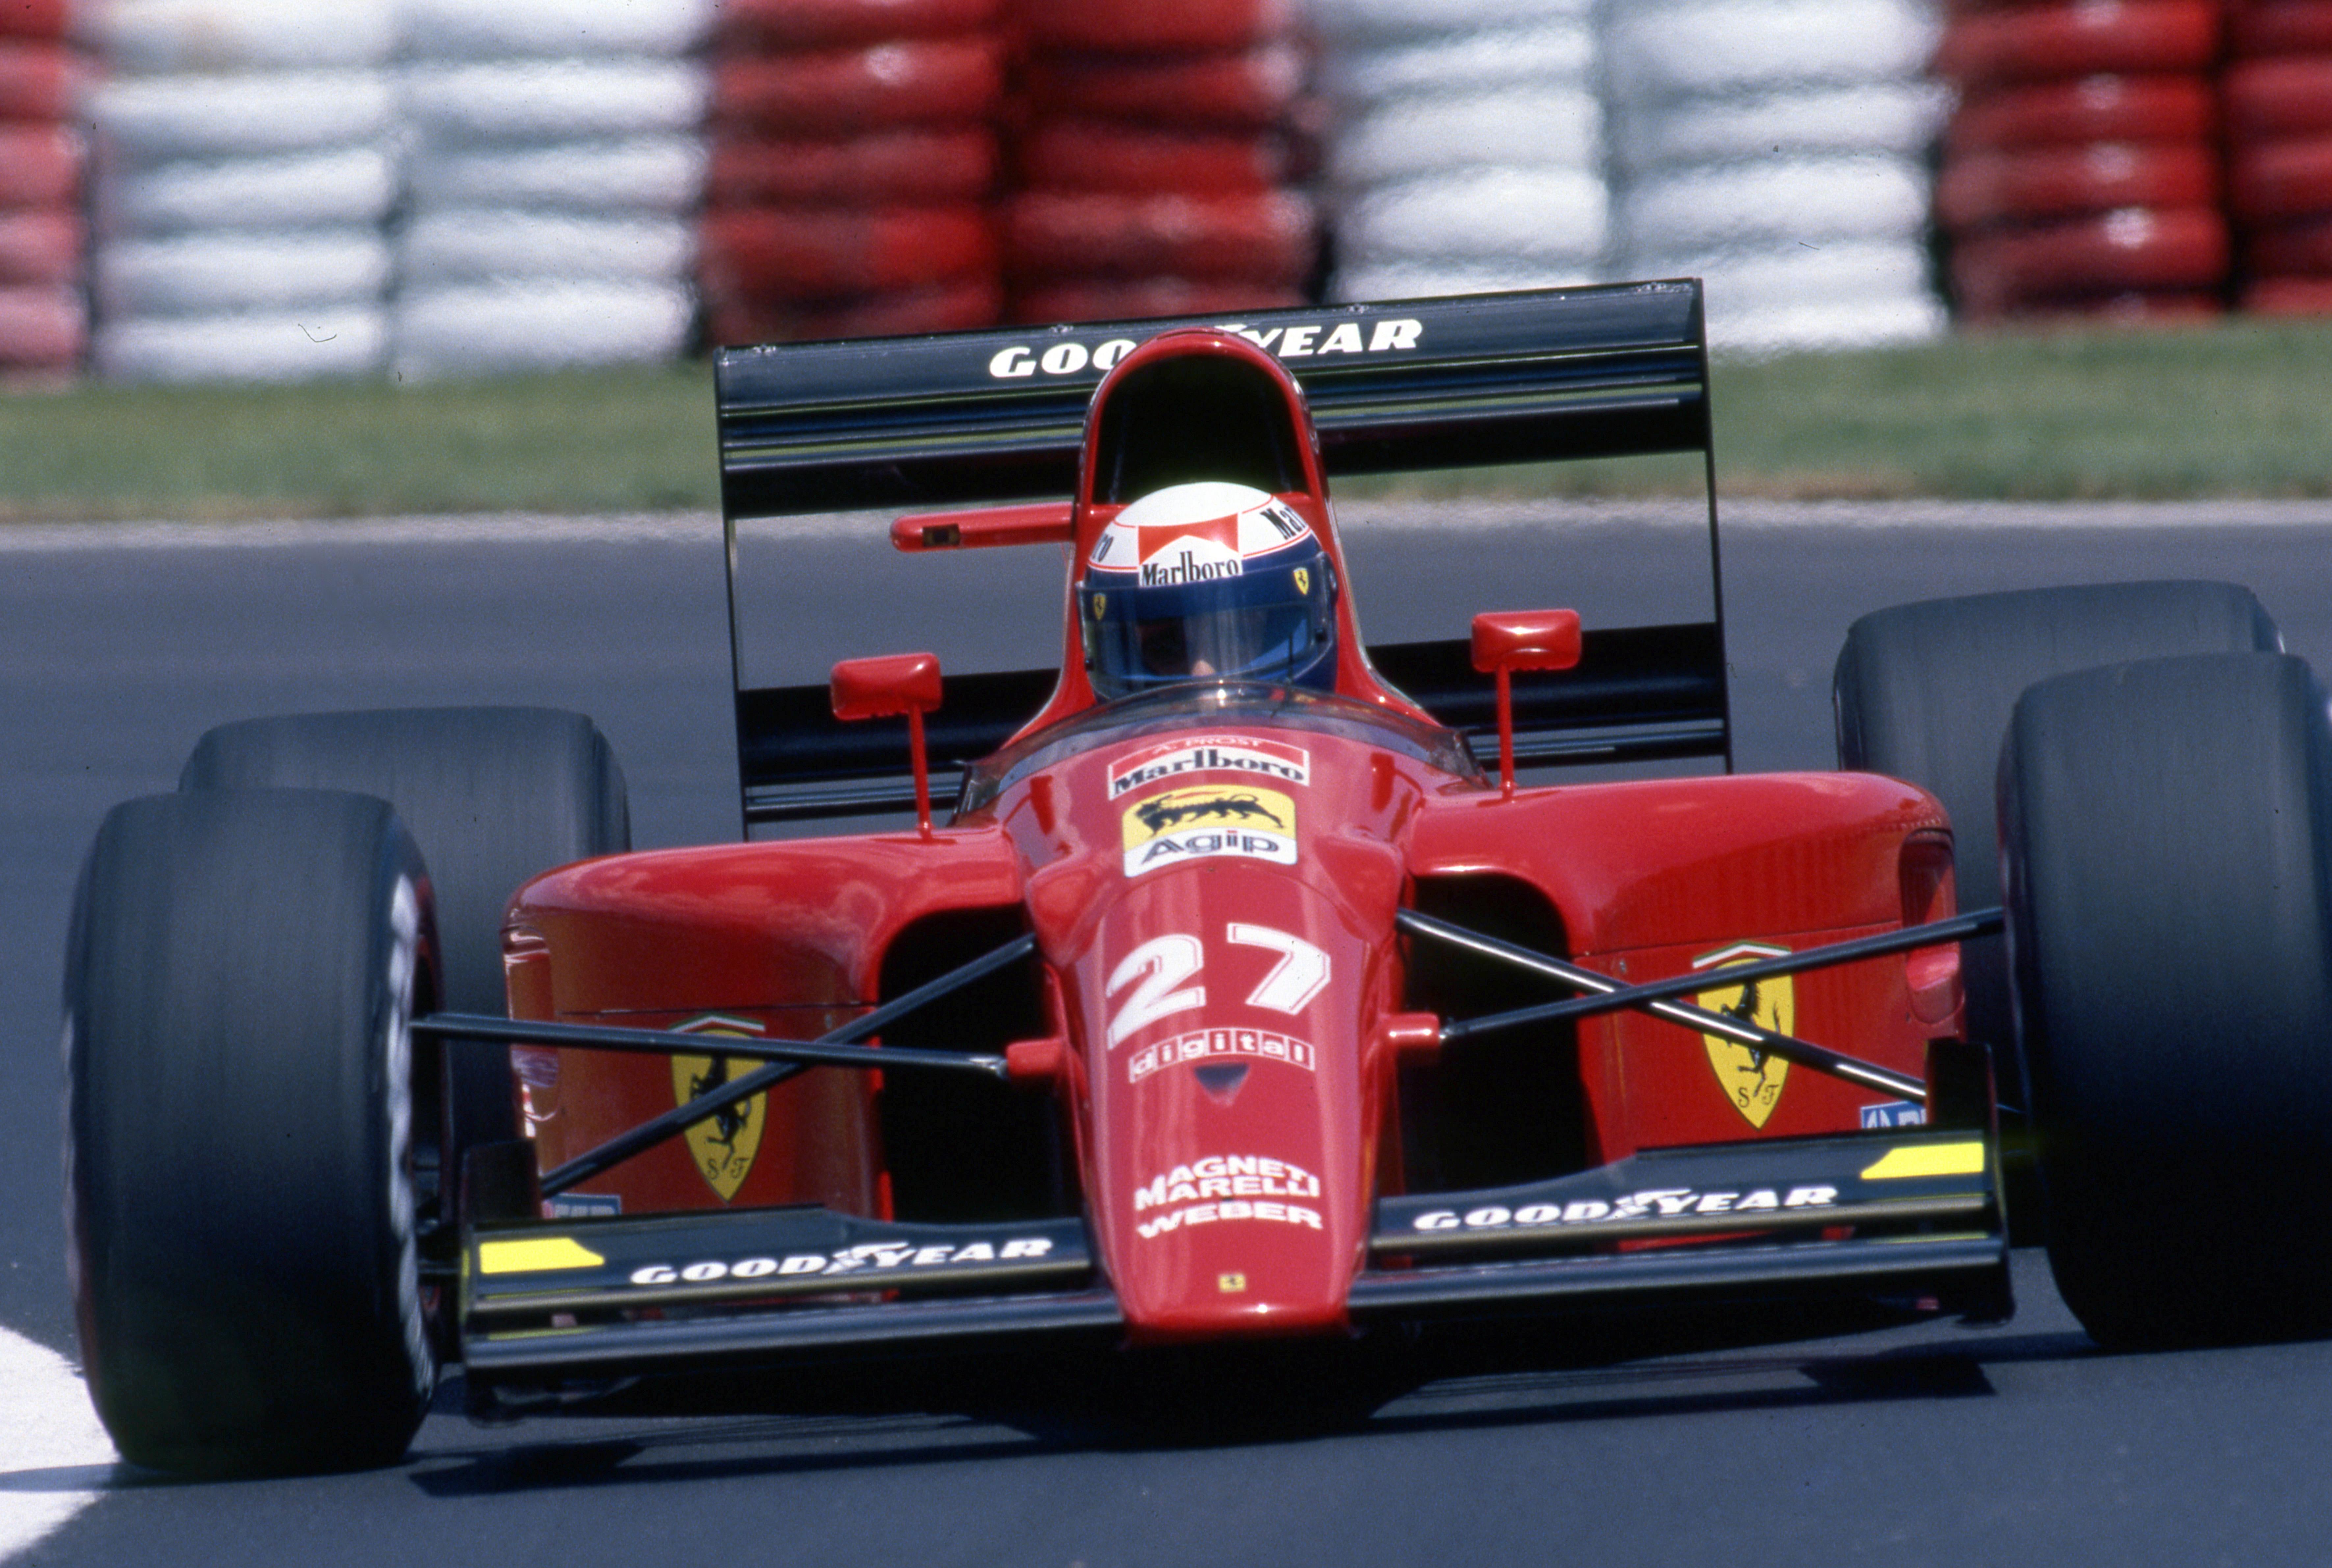 Alain Prost Ferrari F1 1991 Canadian Grand Prix